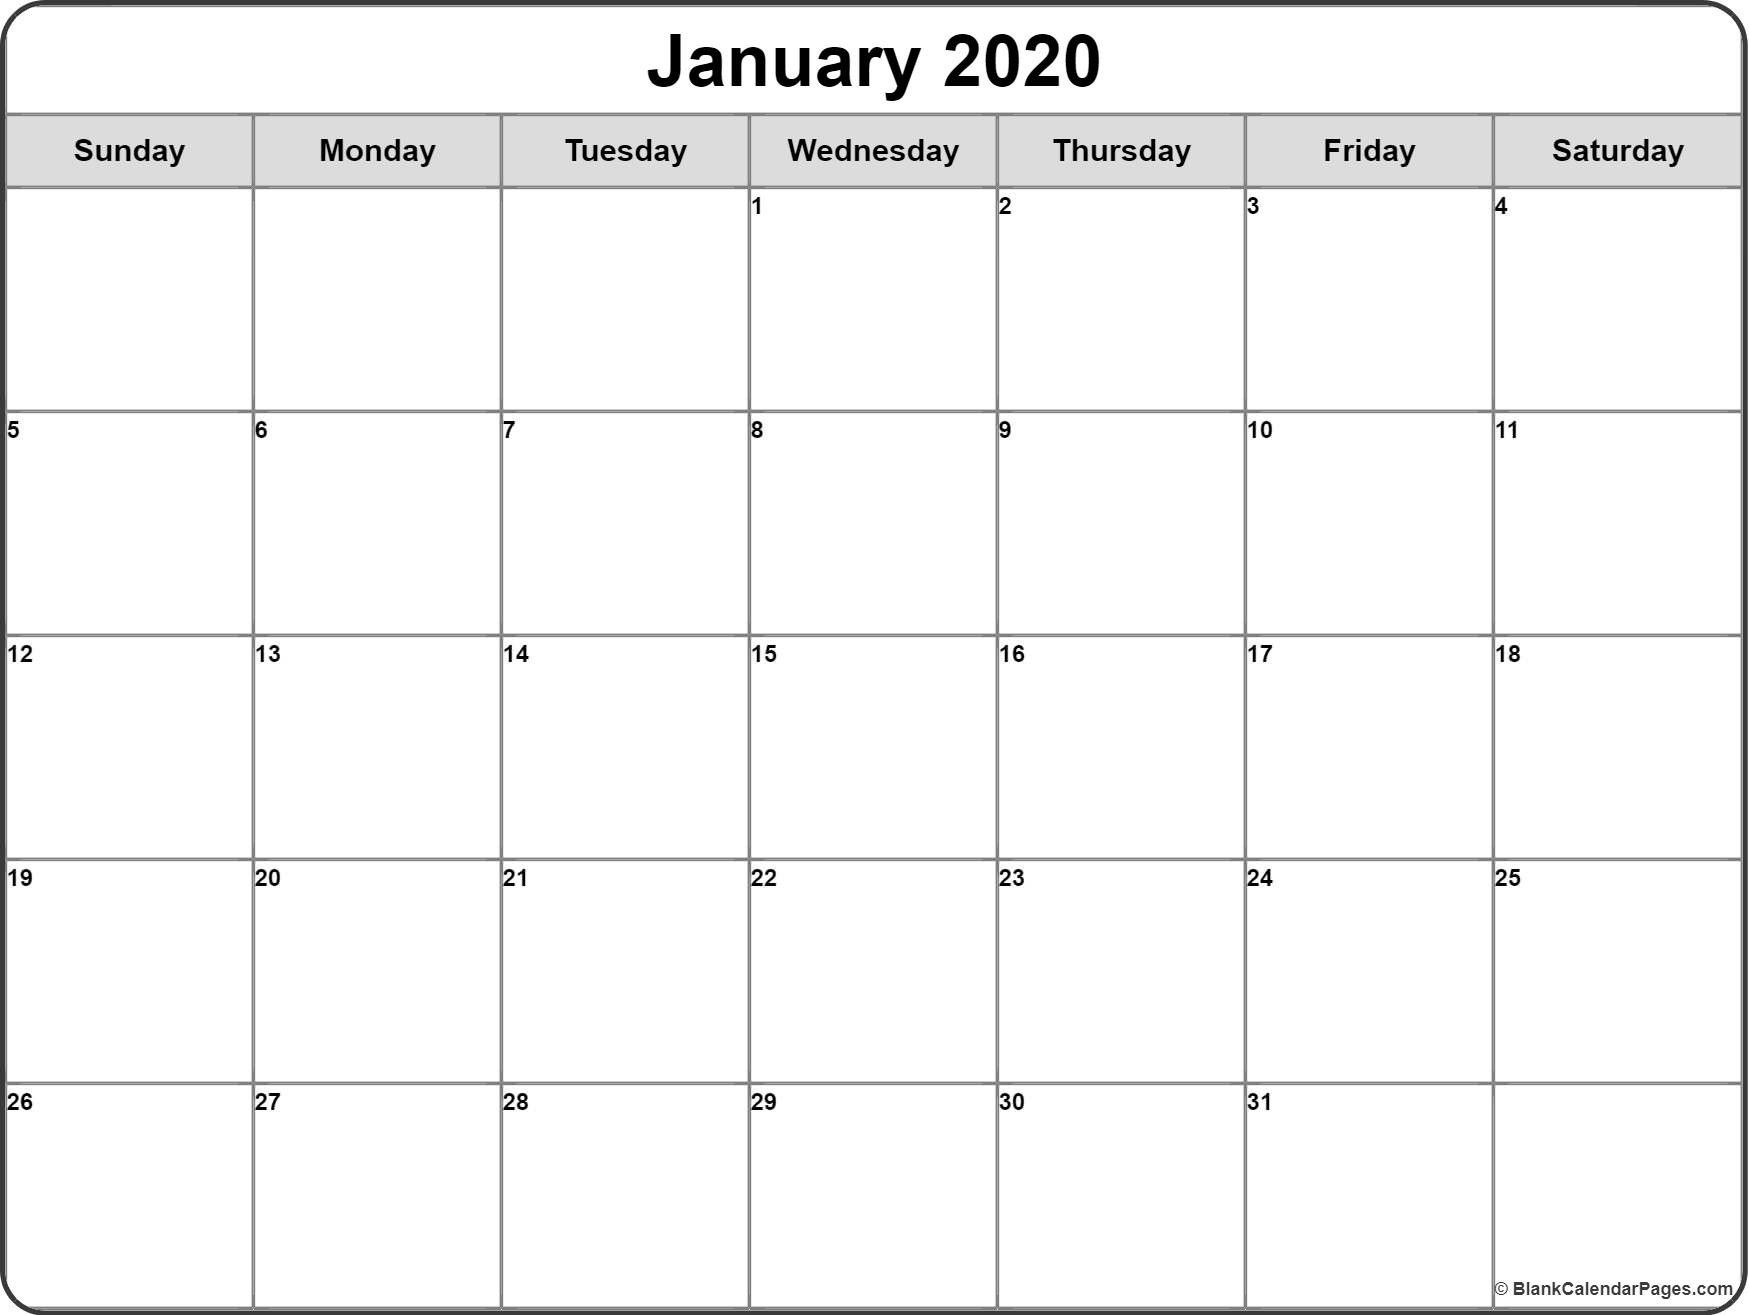 January 2020 Calendar January 2020 Blank Monthly Calendar throughout Free Blank Printable Monthly Calendar 2020